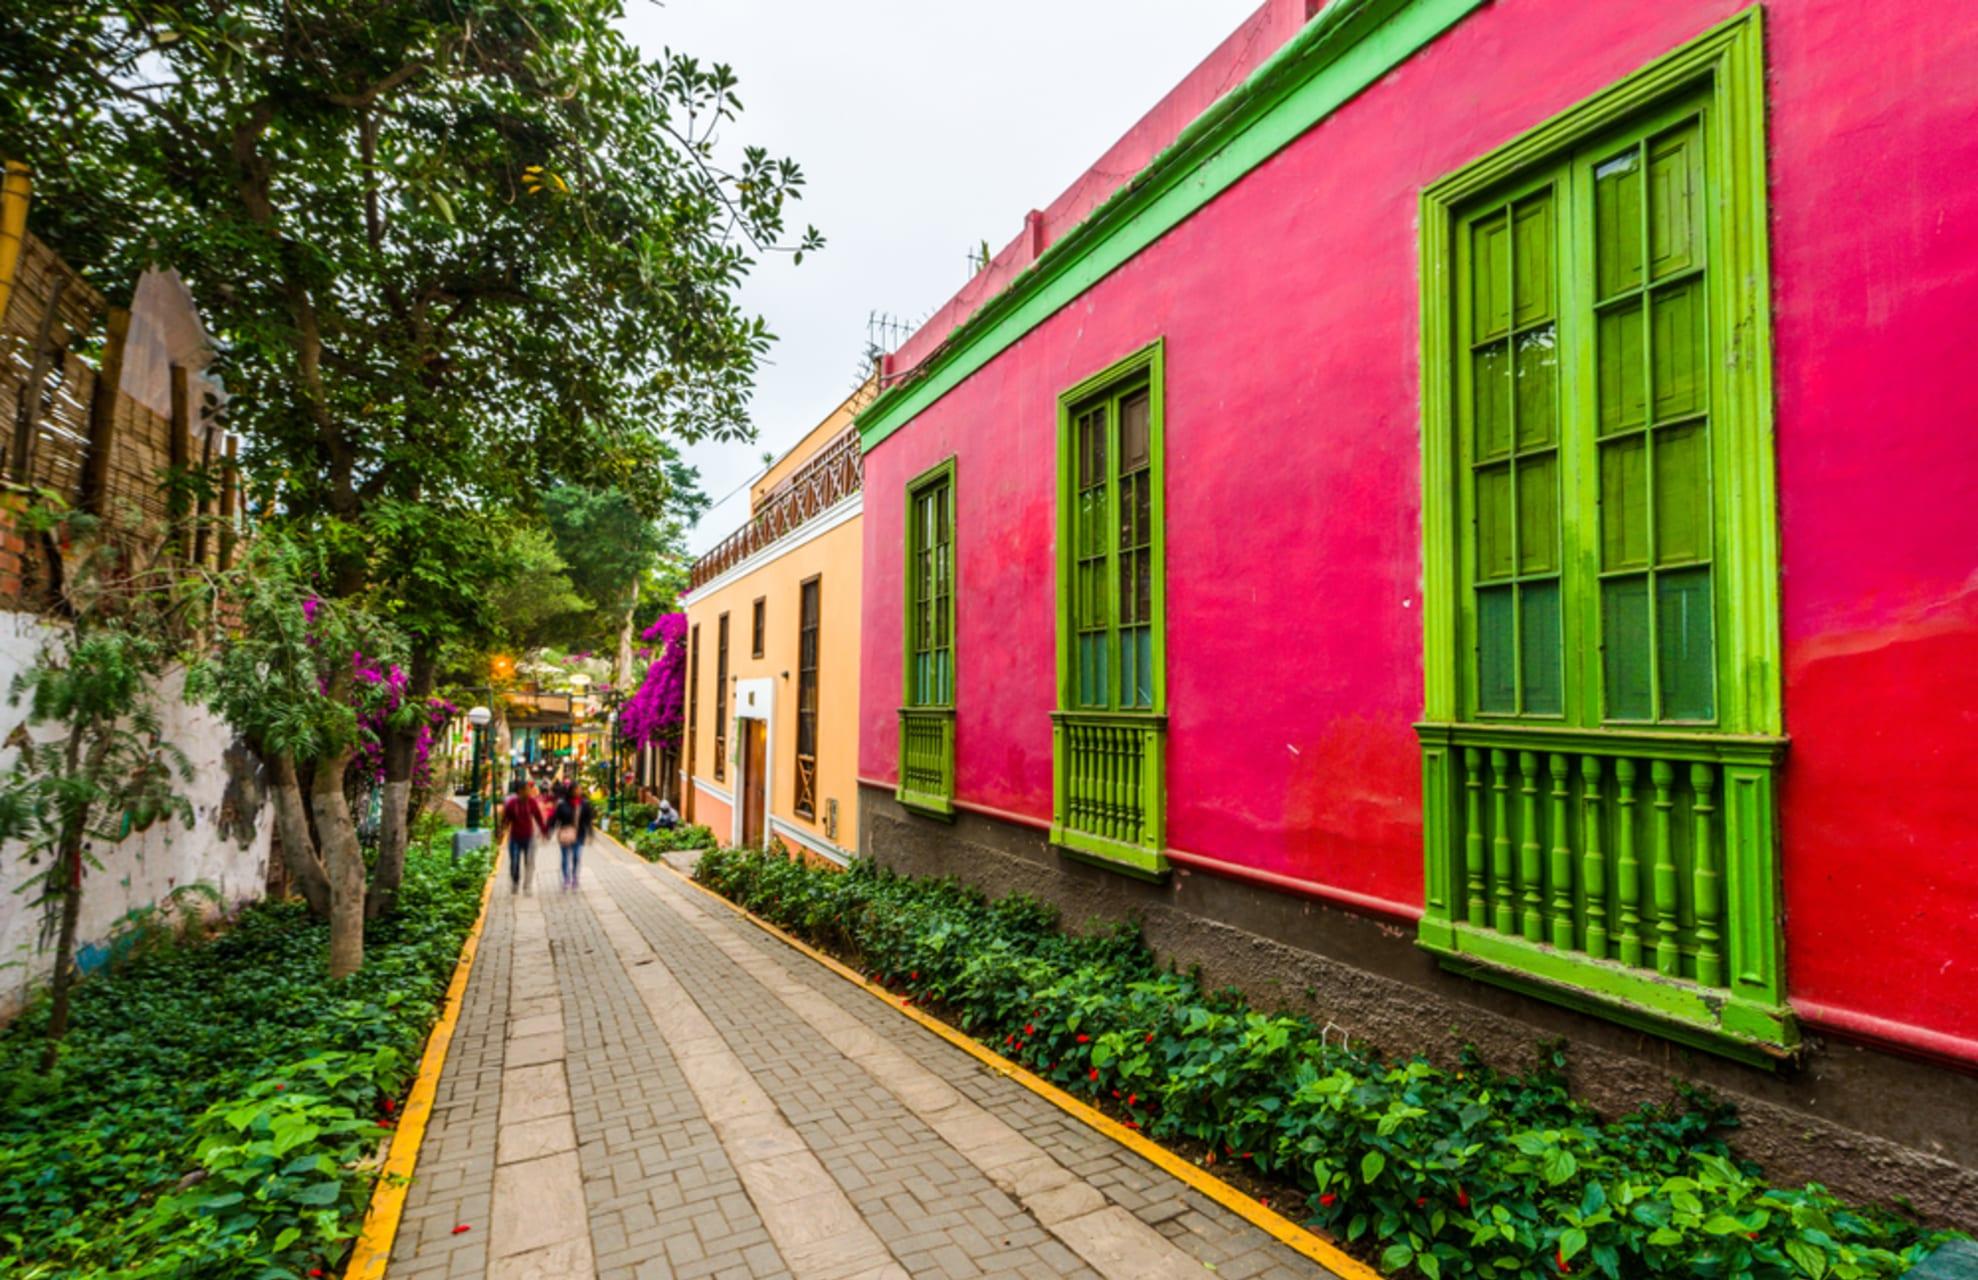 Lima - Bohemian Barranco - Part 2: 19th Century European Immigrations to Lima